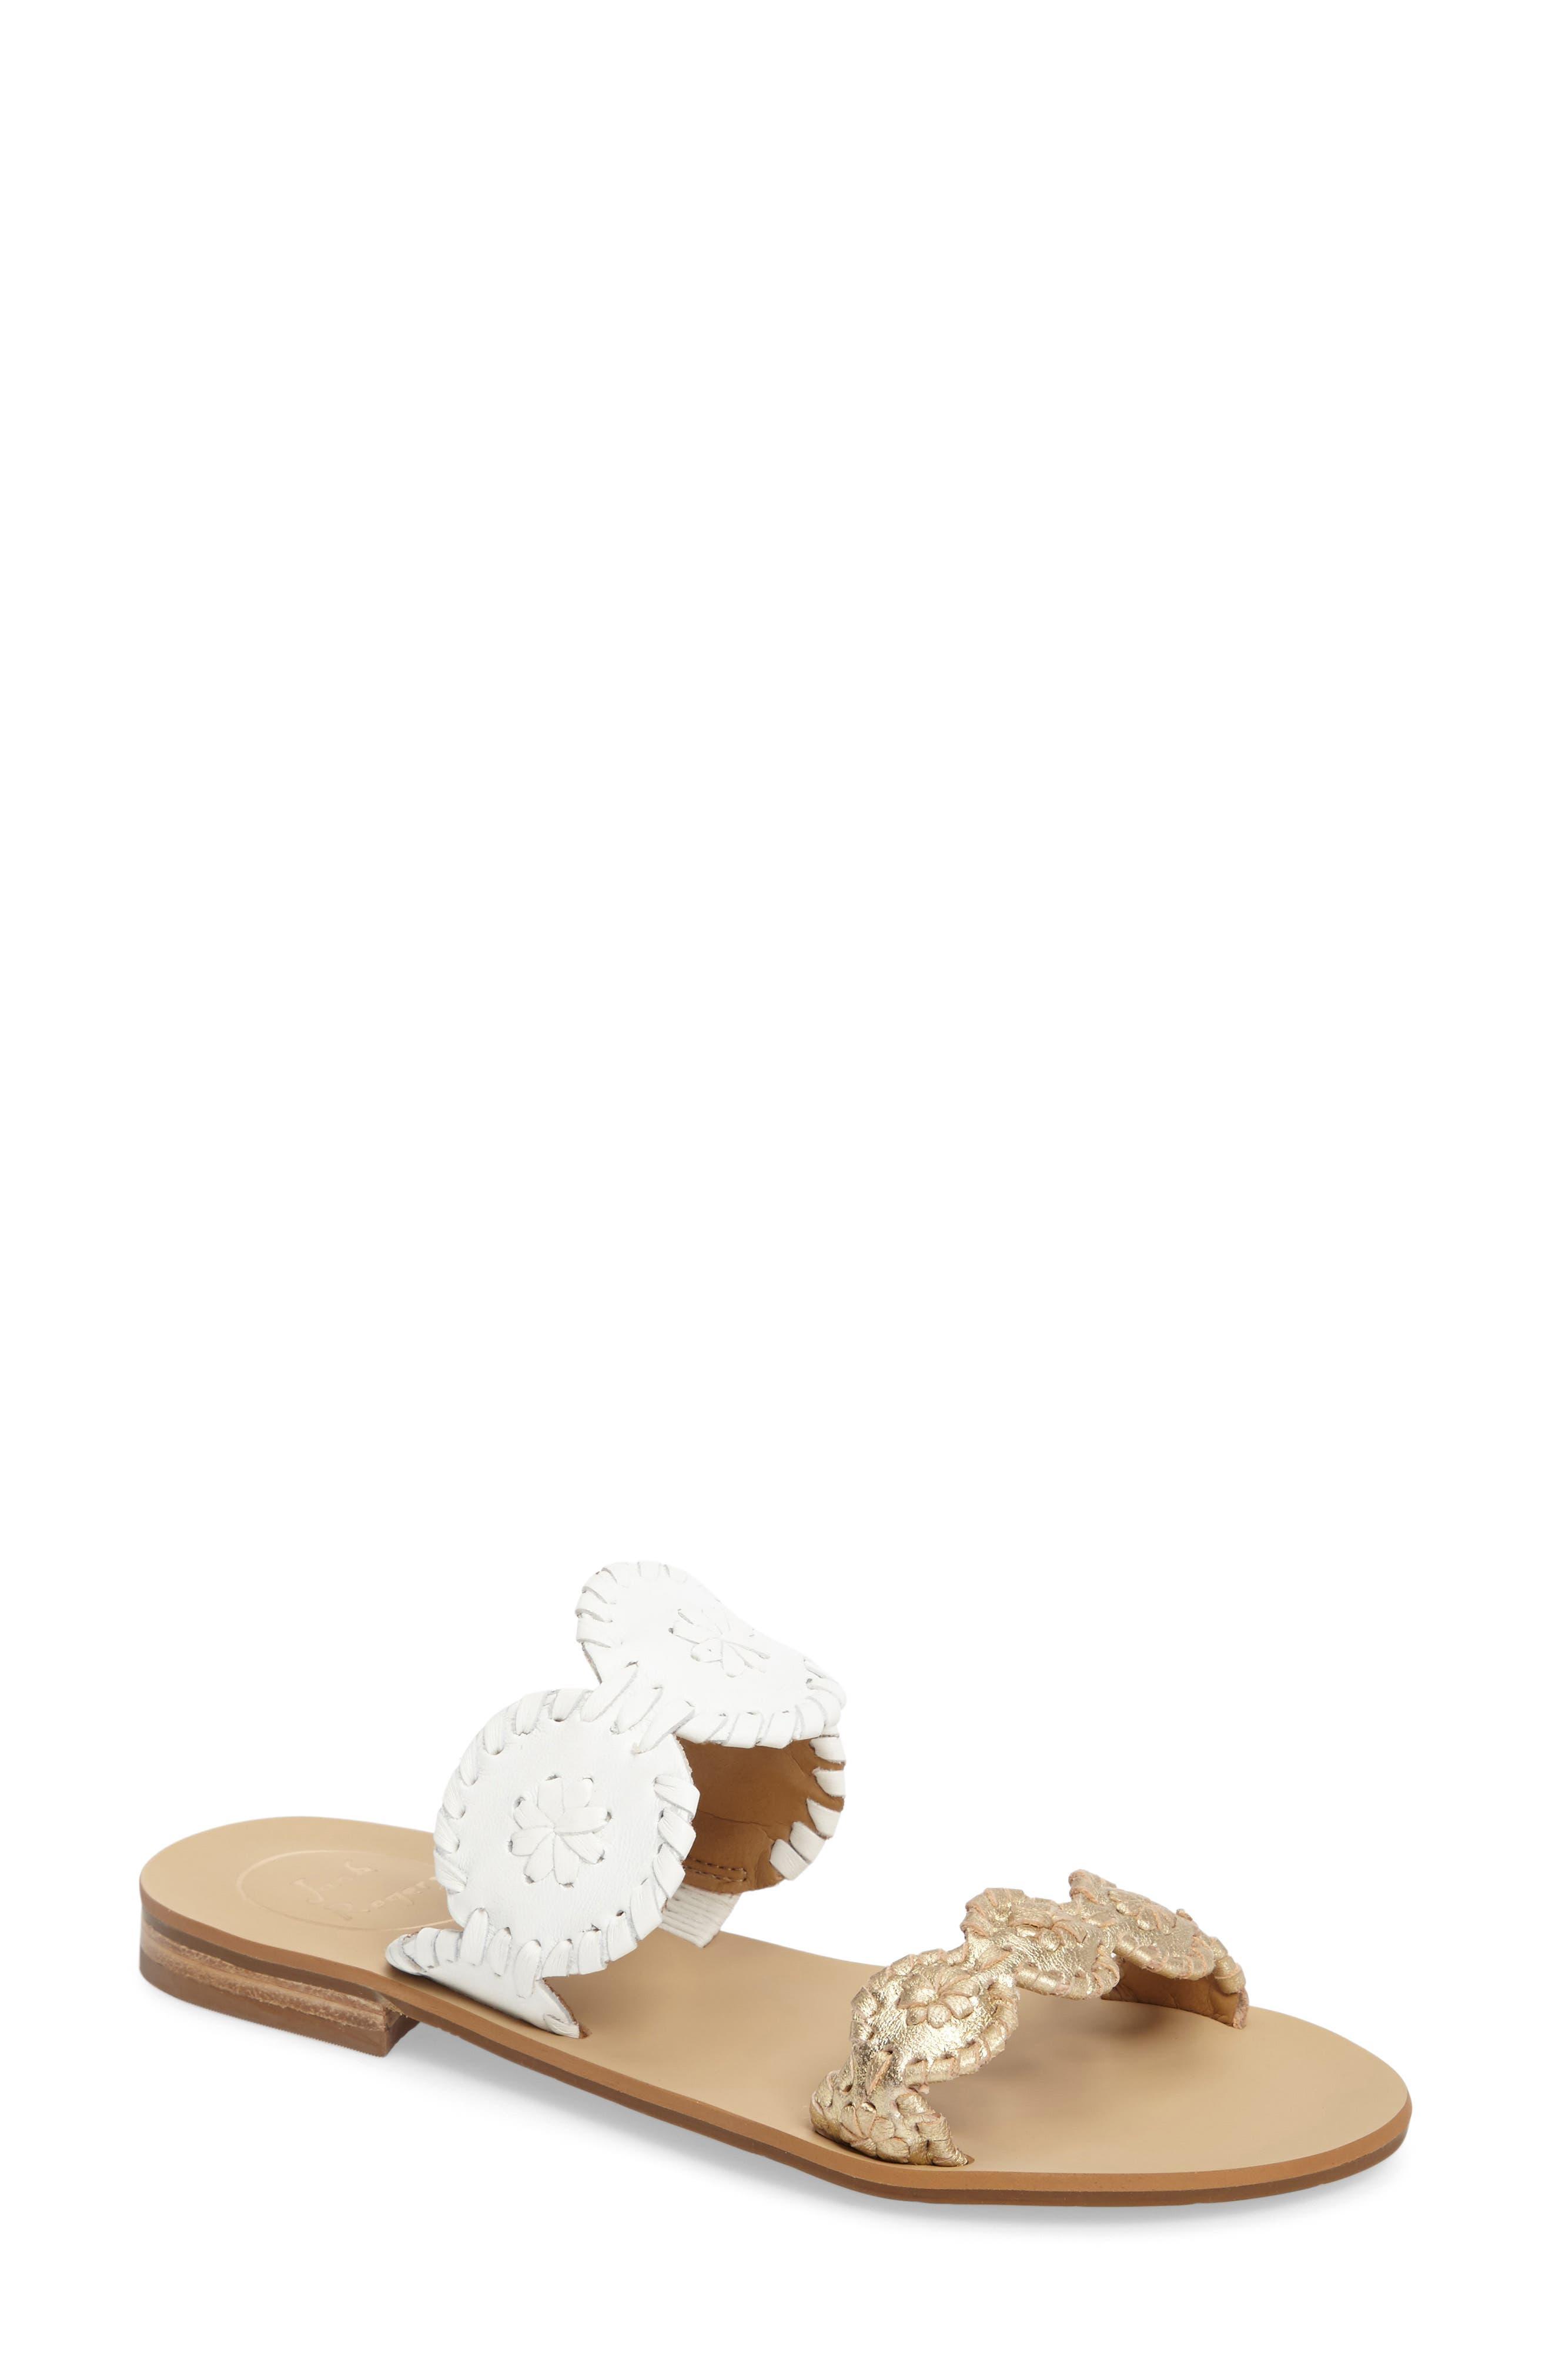 JACK ROGERS 'Lauren' Sandal